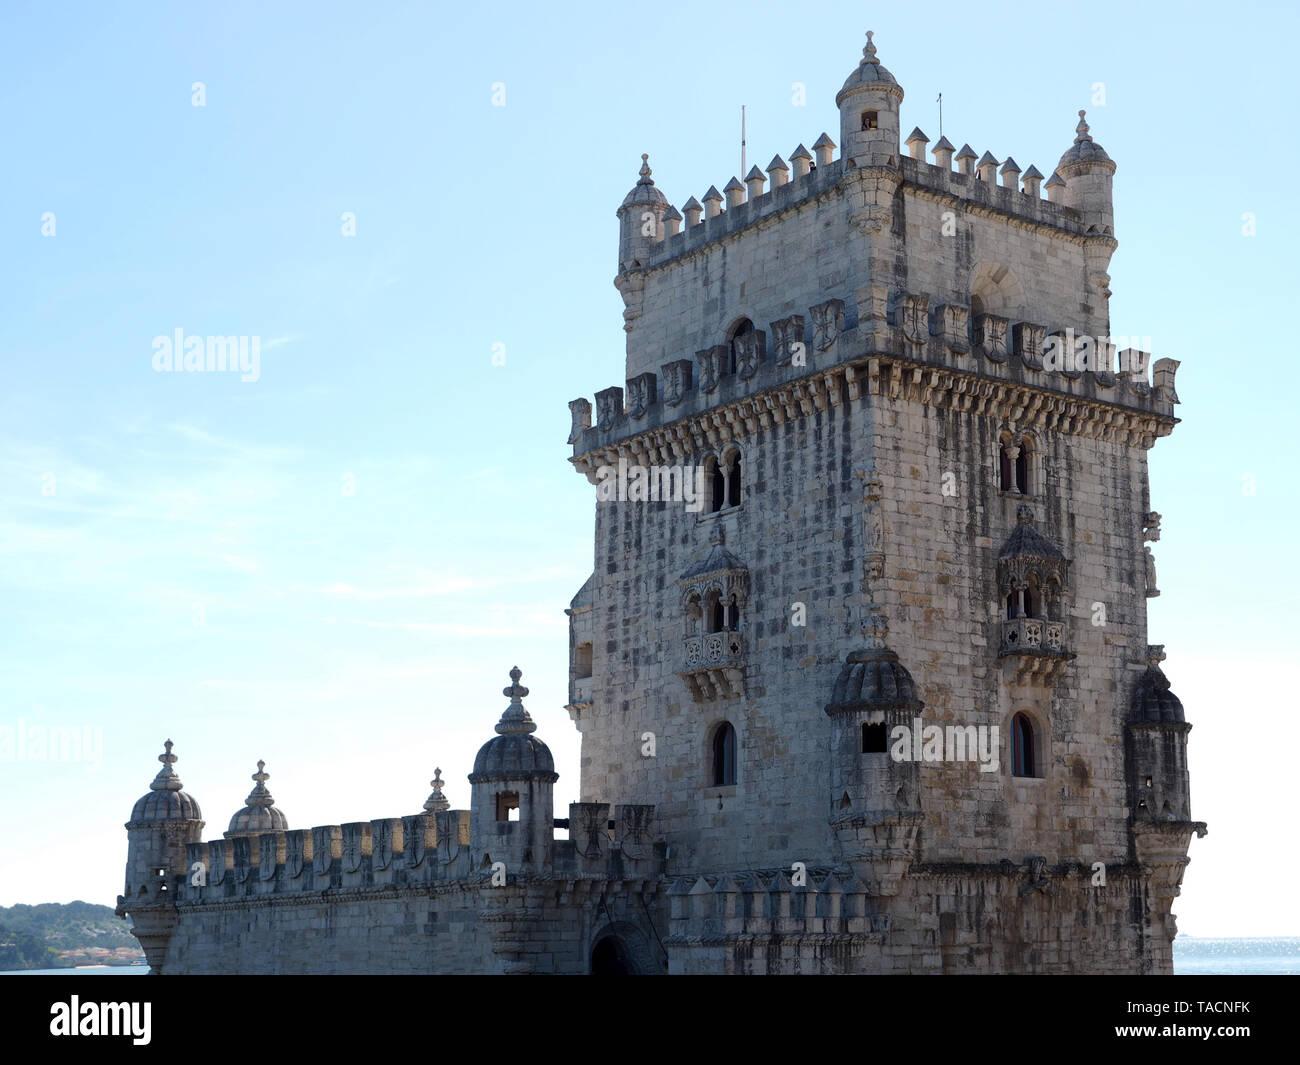 Famous tower or Torre de Belem in Lisbon Stock Photo